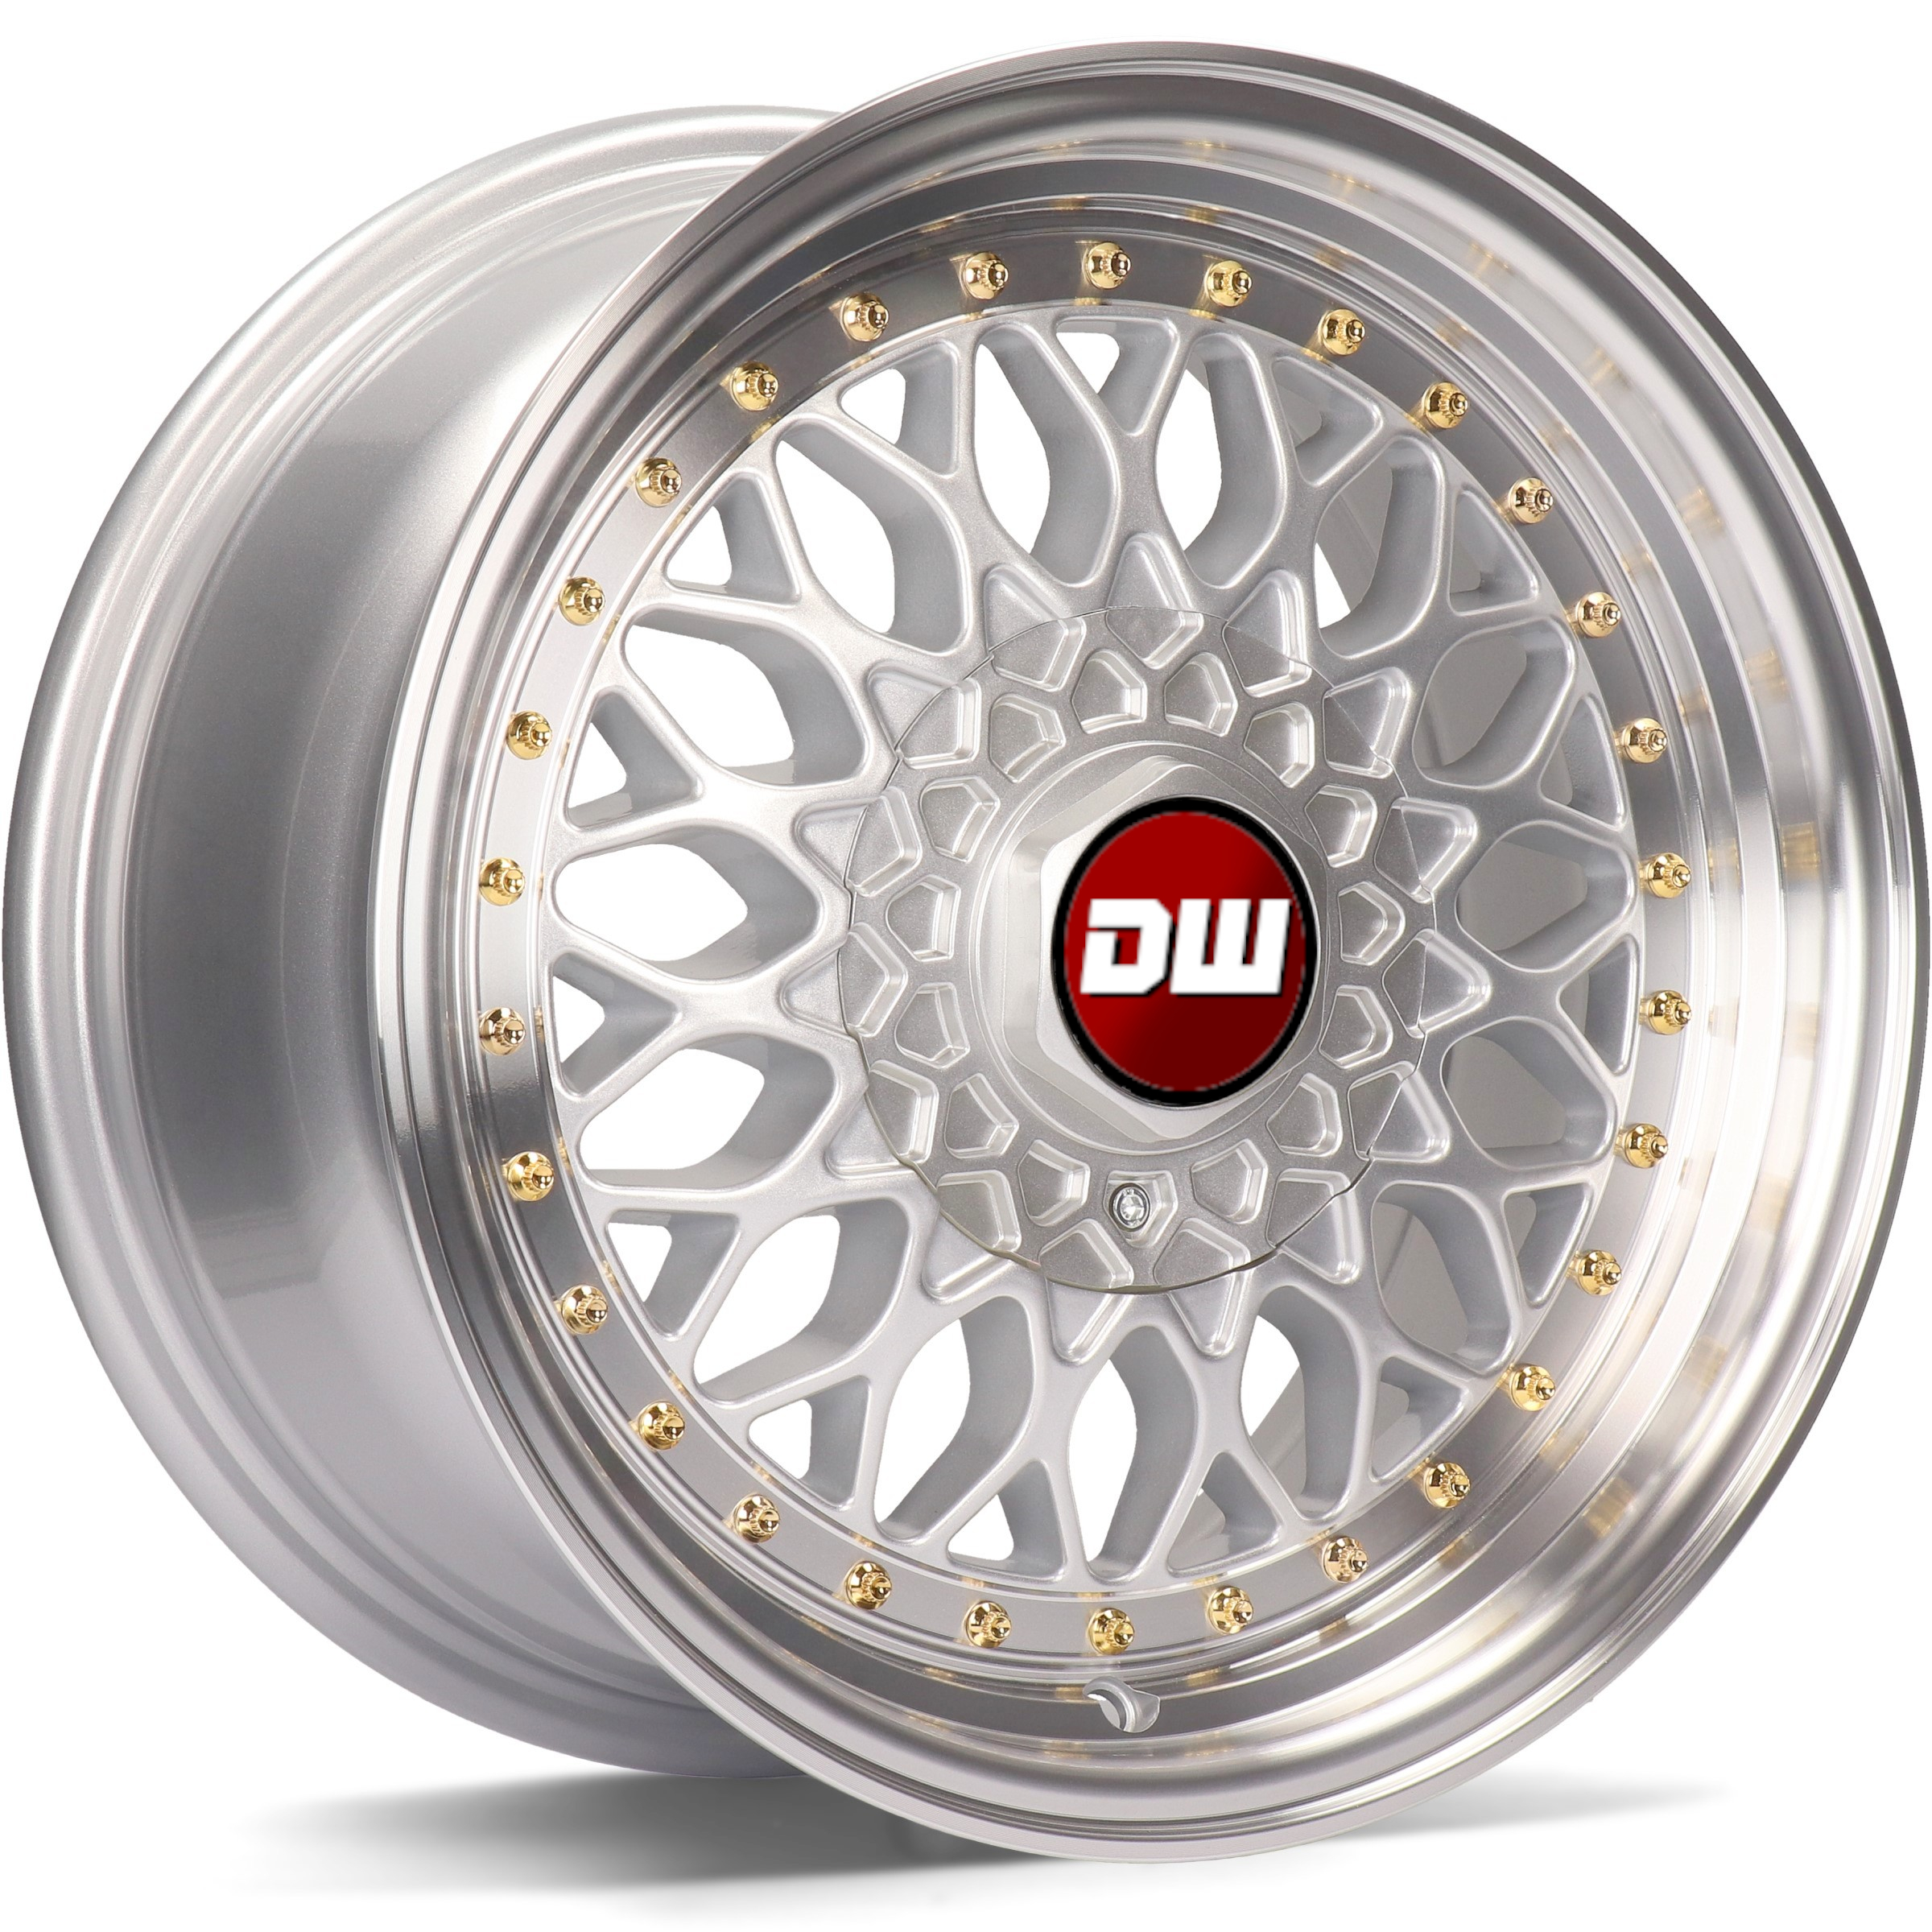 DW Wheels DWV-E [7x15] ET30 8x100/114